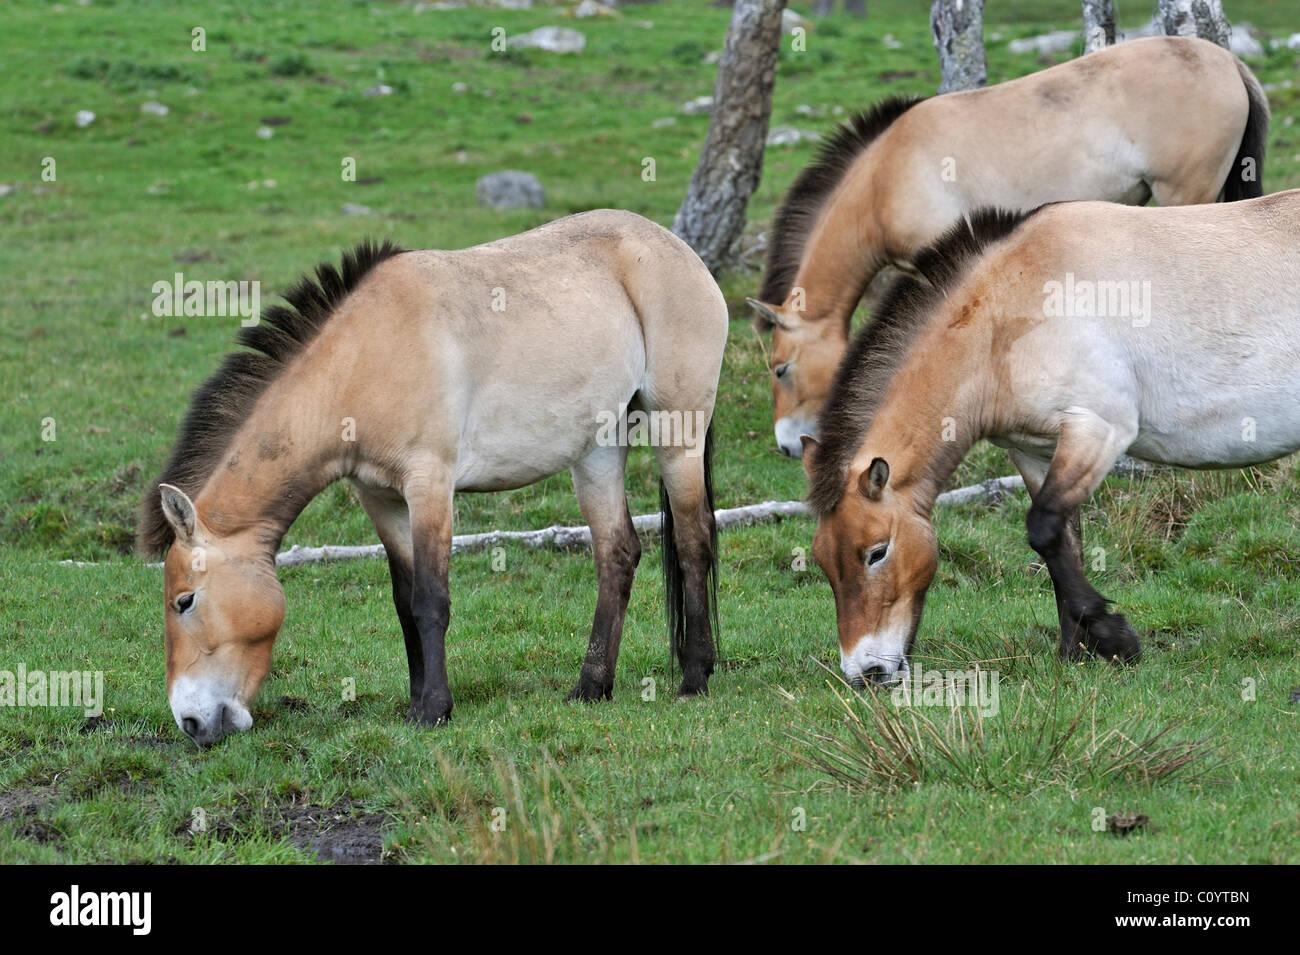 Przewalski's Horses (Equus ferus przewalskii) grazing in field, Scotland, UK - Stock Image